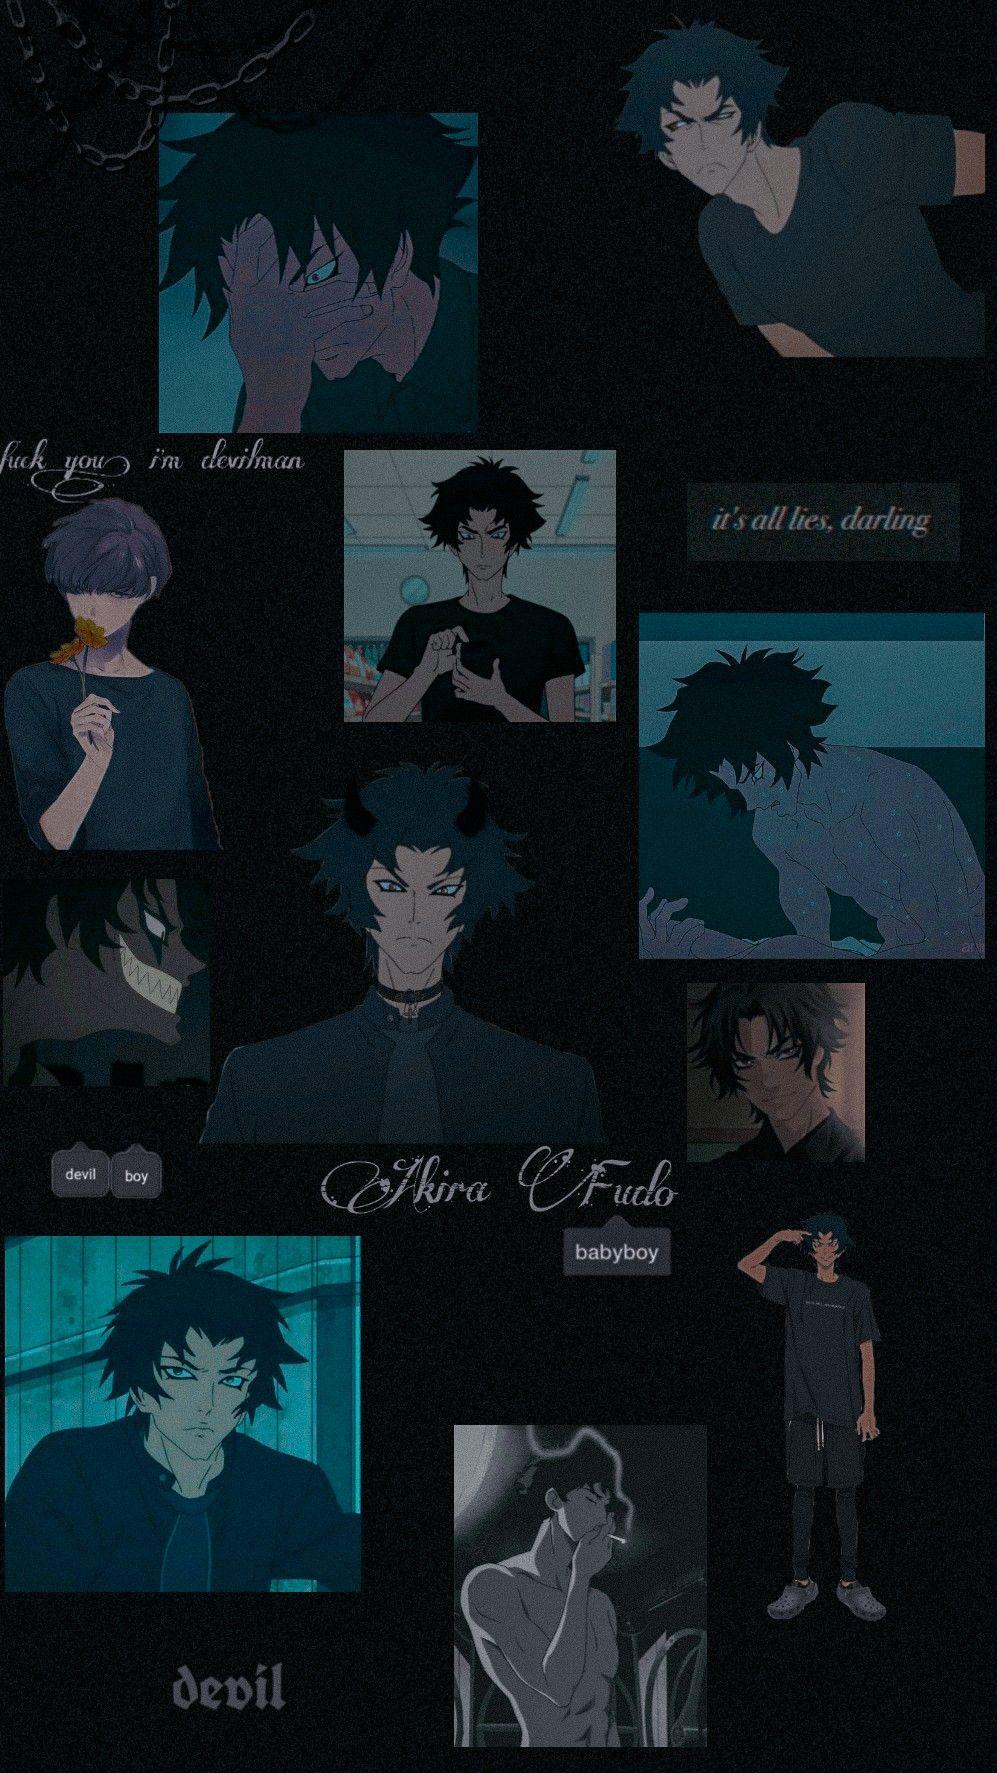 Wallpaper Akira Fudo In 2020 Devilman Crybaby Cute Anime Wallpaper Anime Background